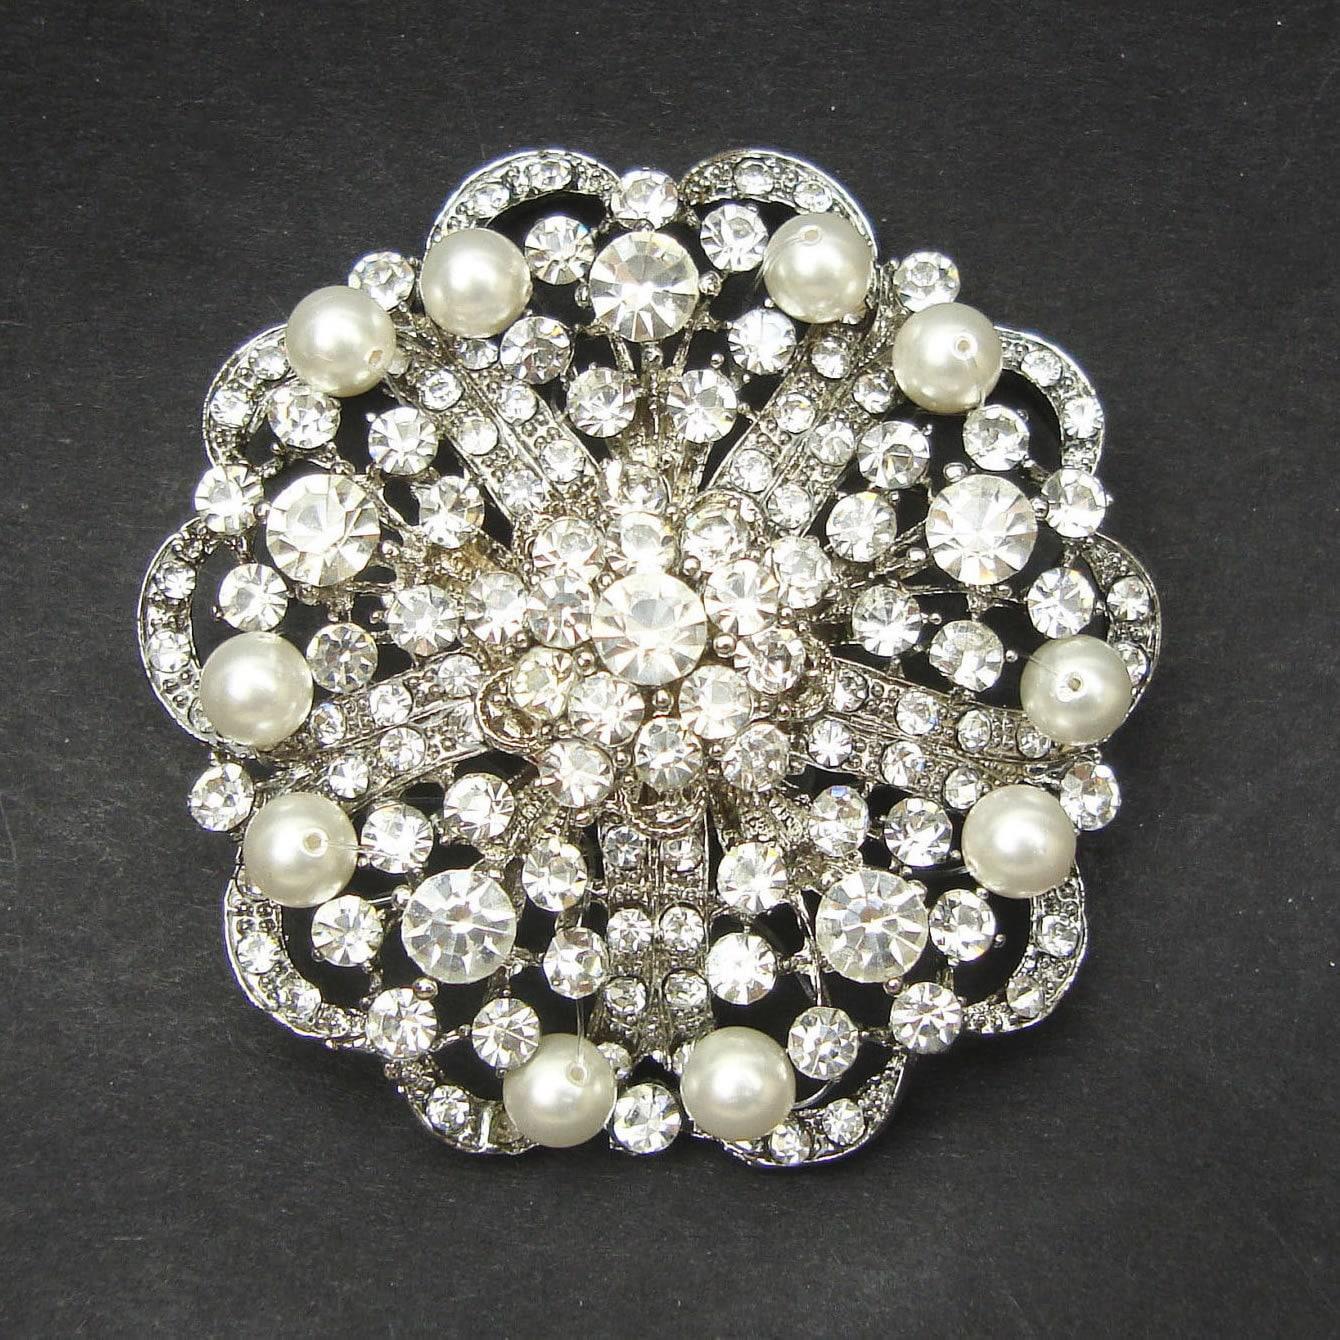 Vintage Pearl & Crystal Bridal Brooch Victorian Wedding